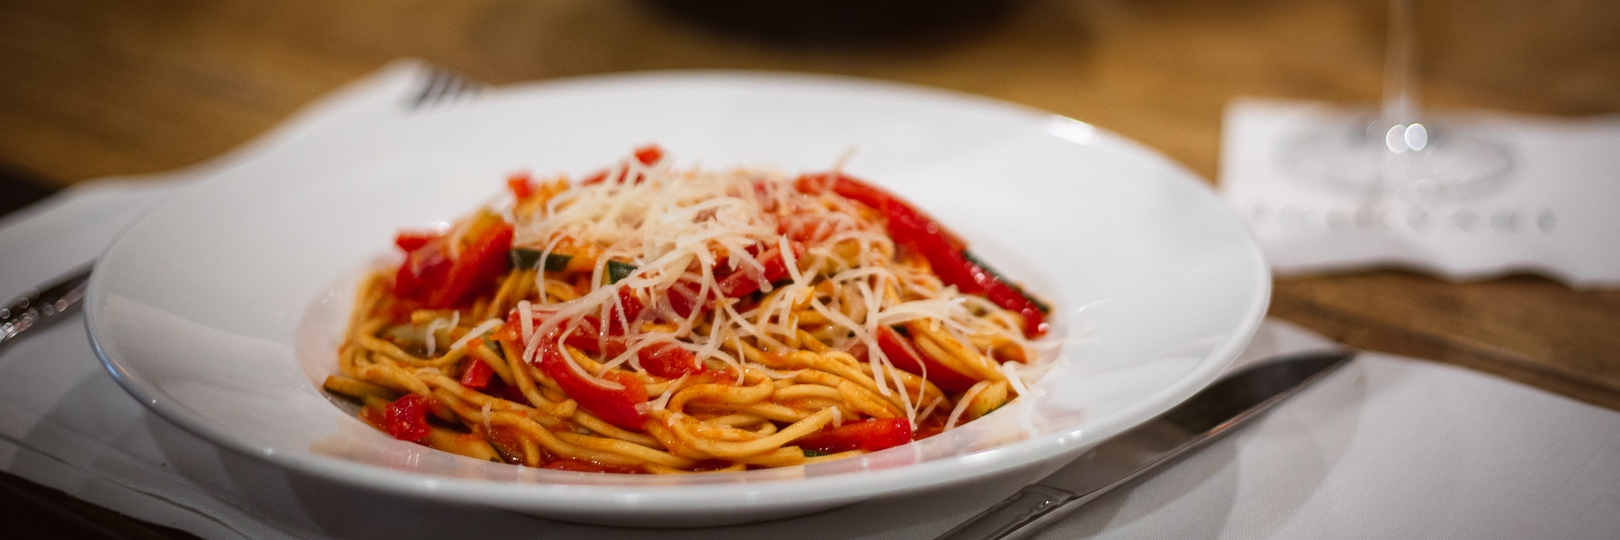 3 Giovani - NYC Italian Restaurant - Pasta.jpg